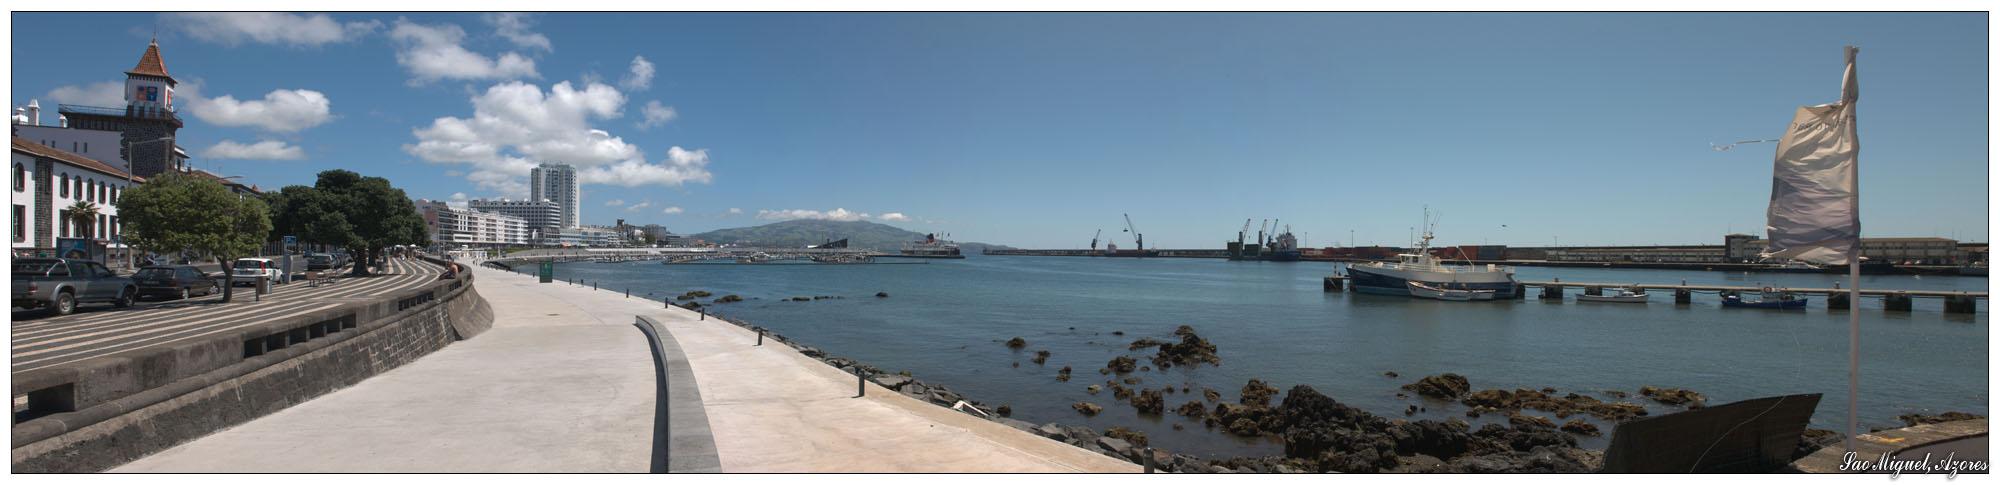 Ponta Delgada -7- (Sao Miguel, Azoren)